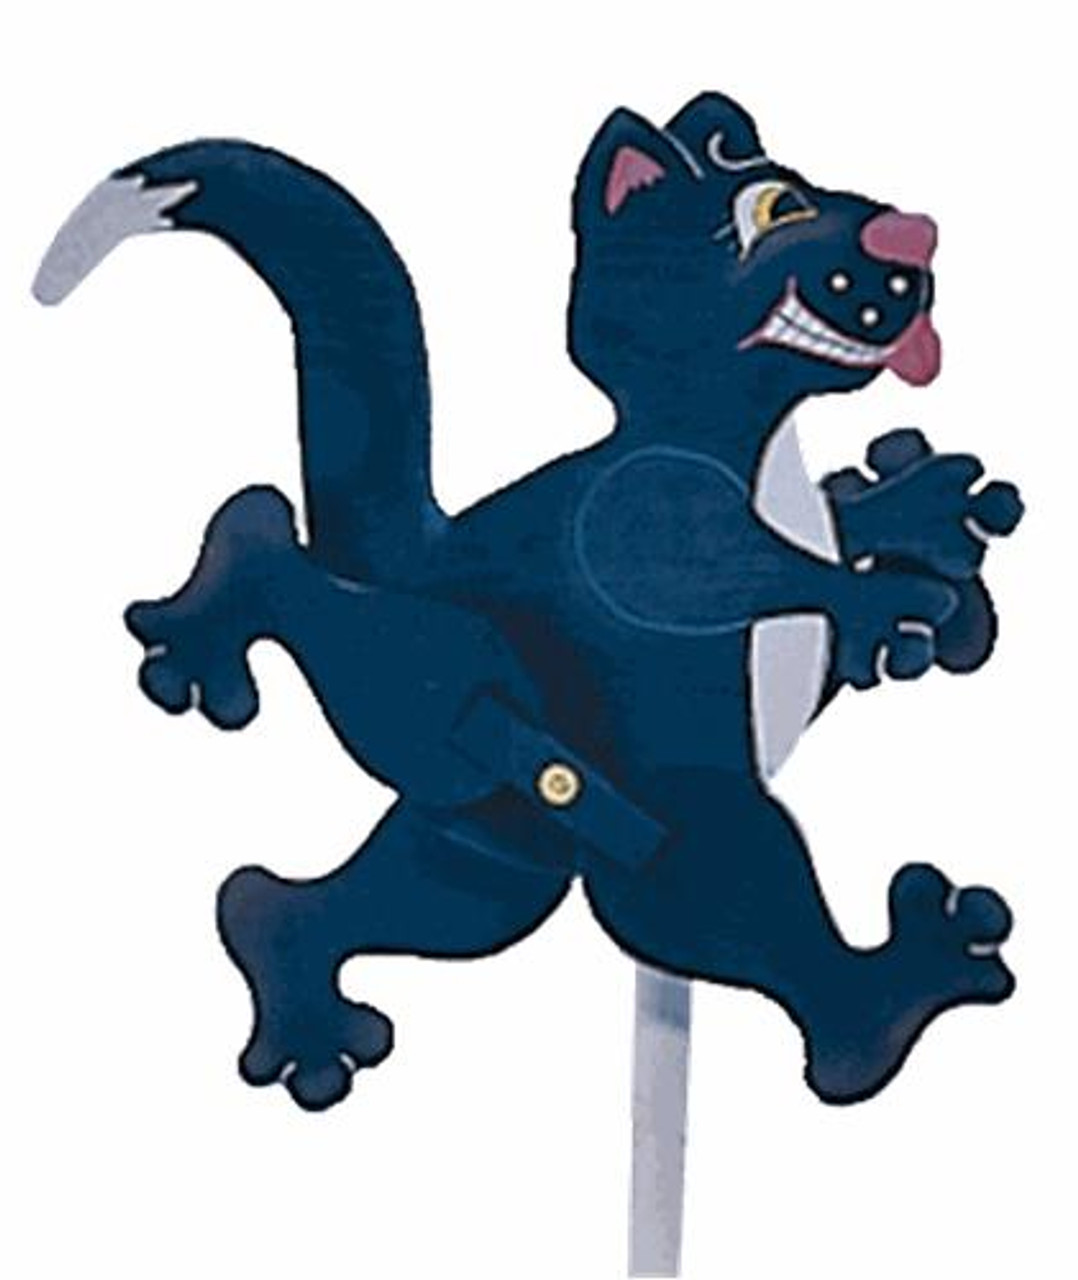 Cherry Tree Toys Cat Whirligig Plan